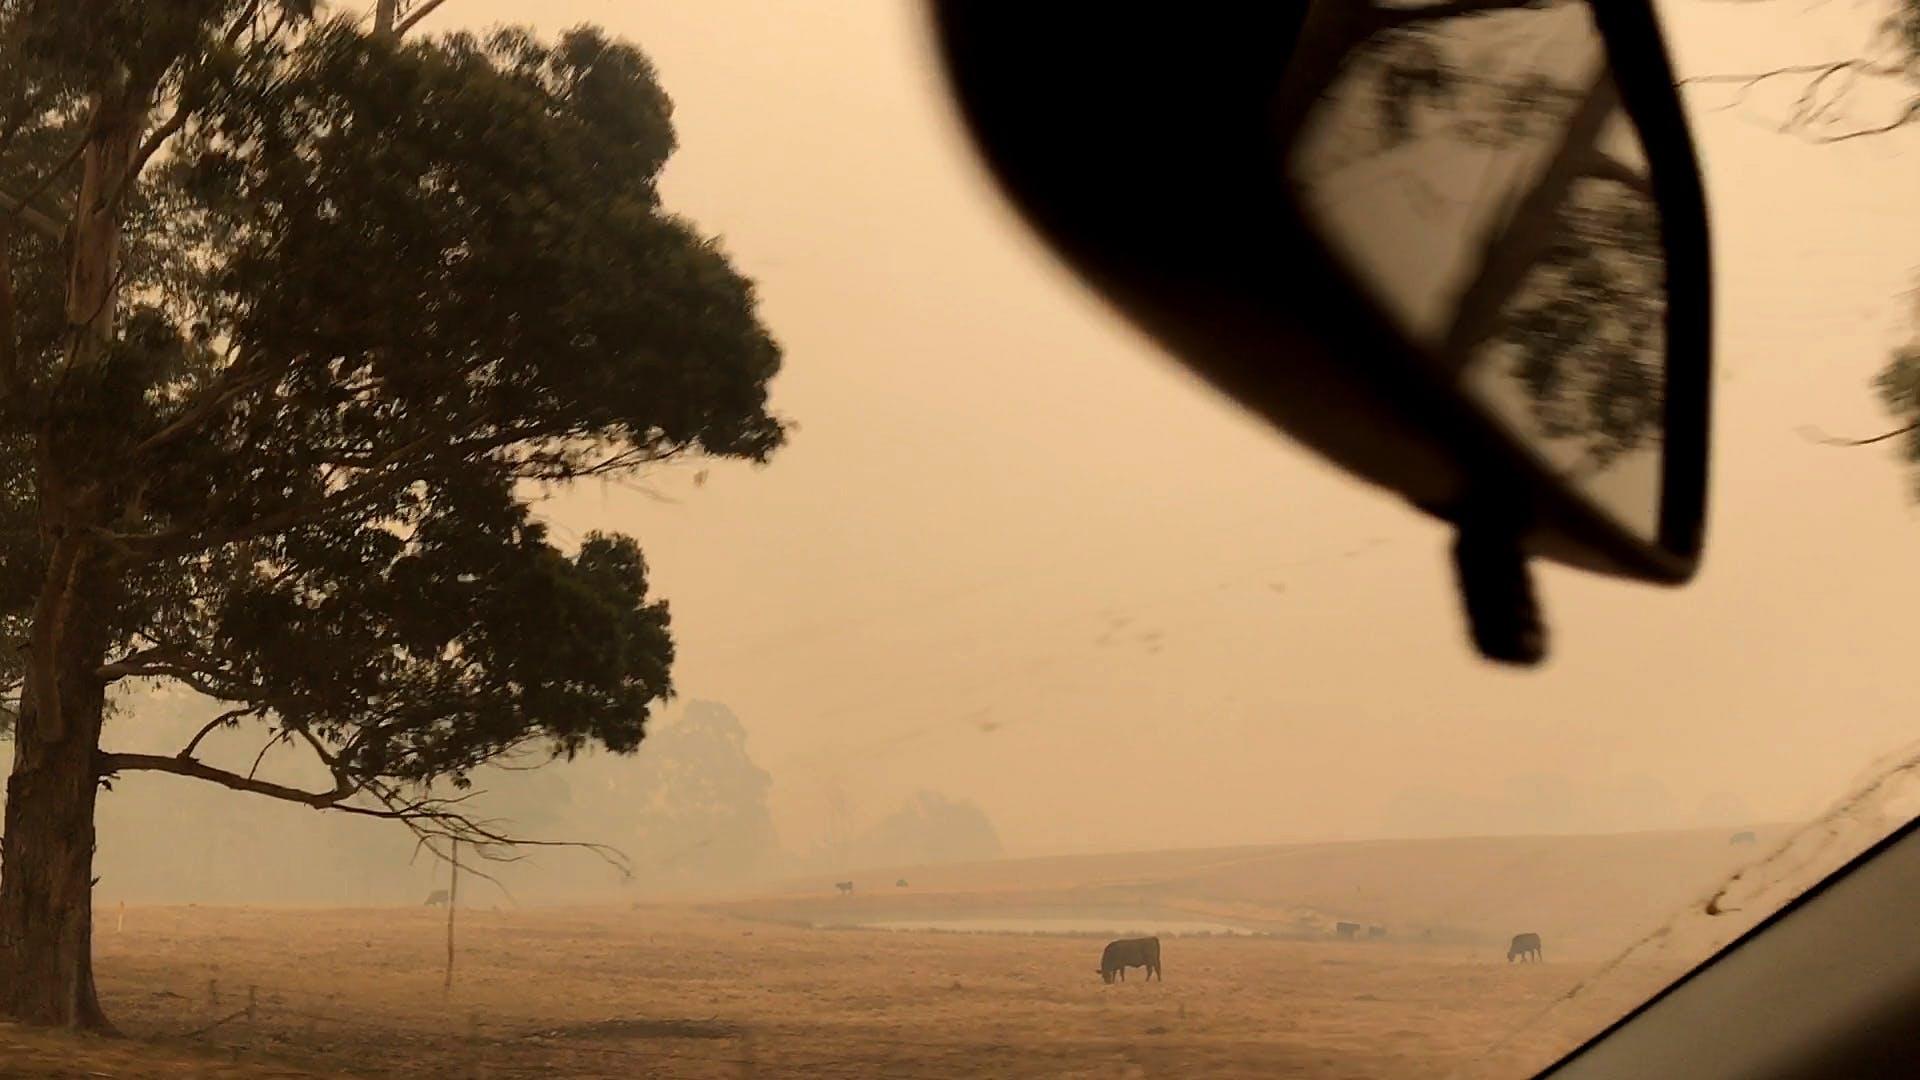 Cows-next-to-Mount-Darragh-Rd-drive-toward-Wyndham-fire-1577919665